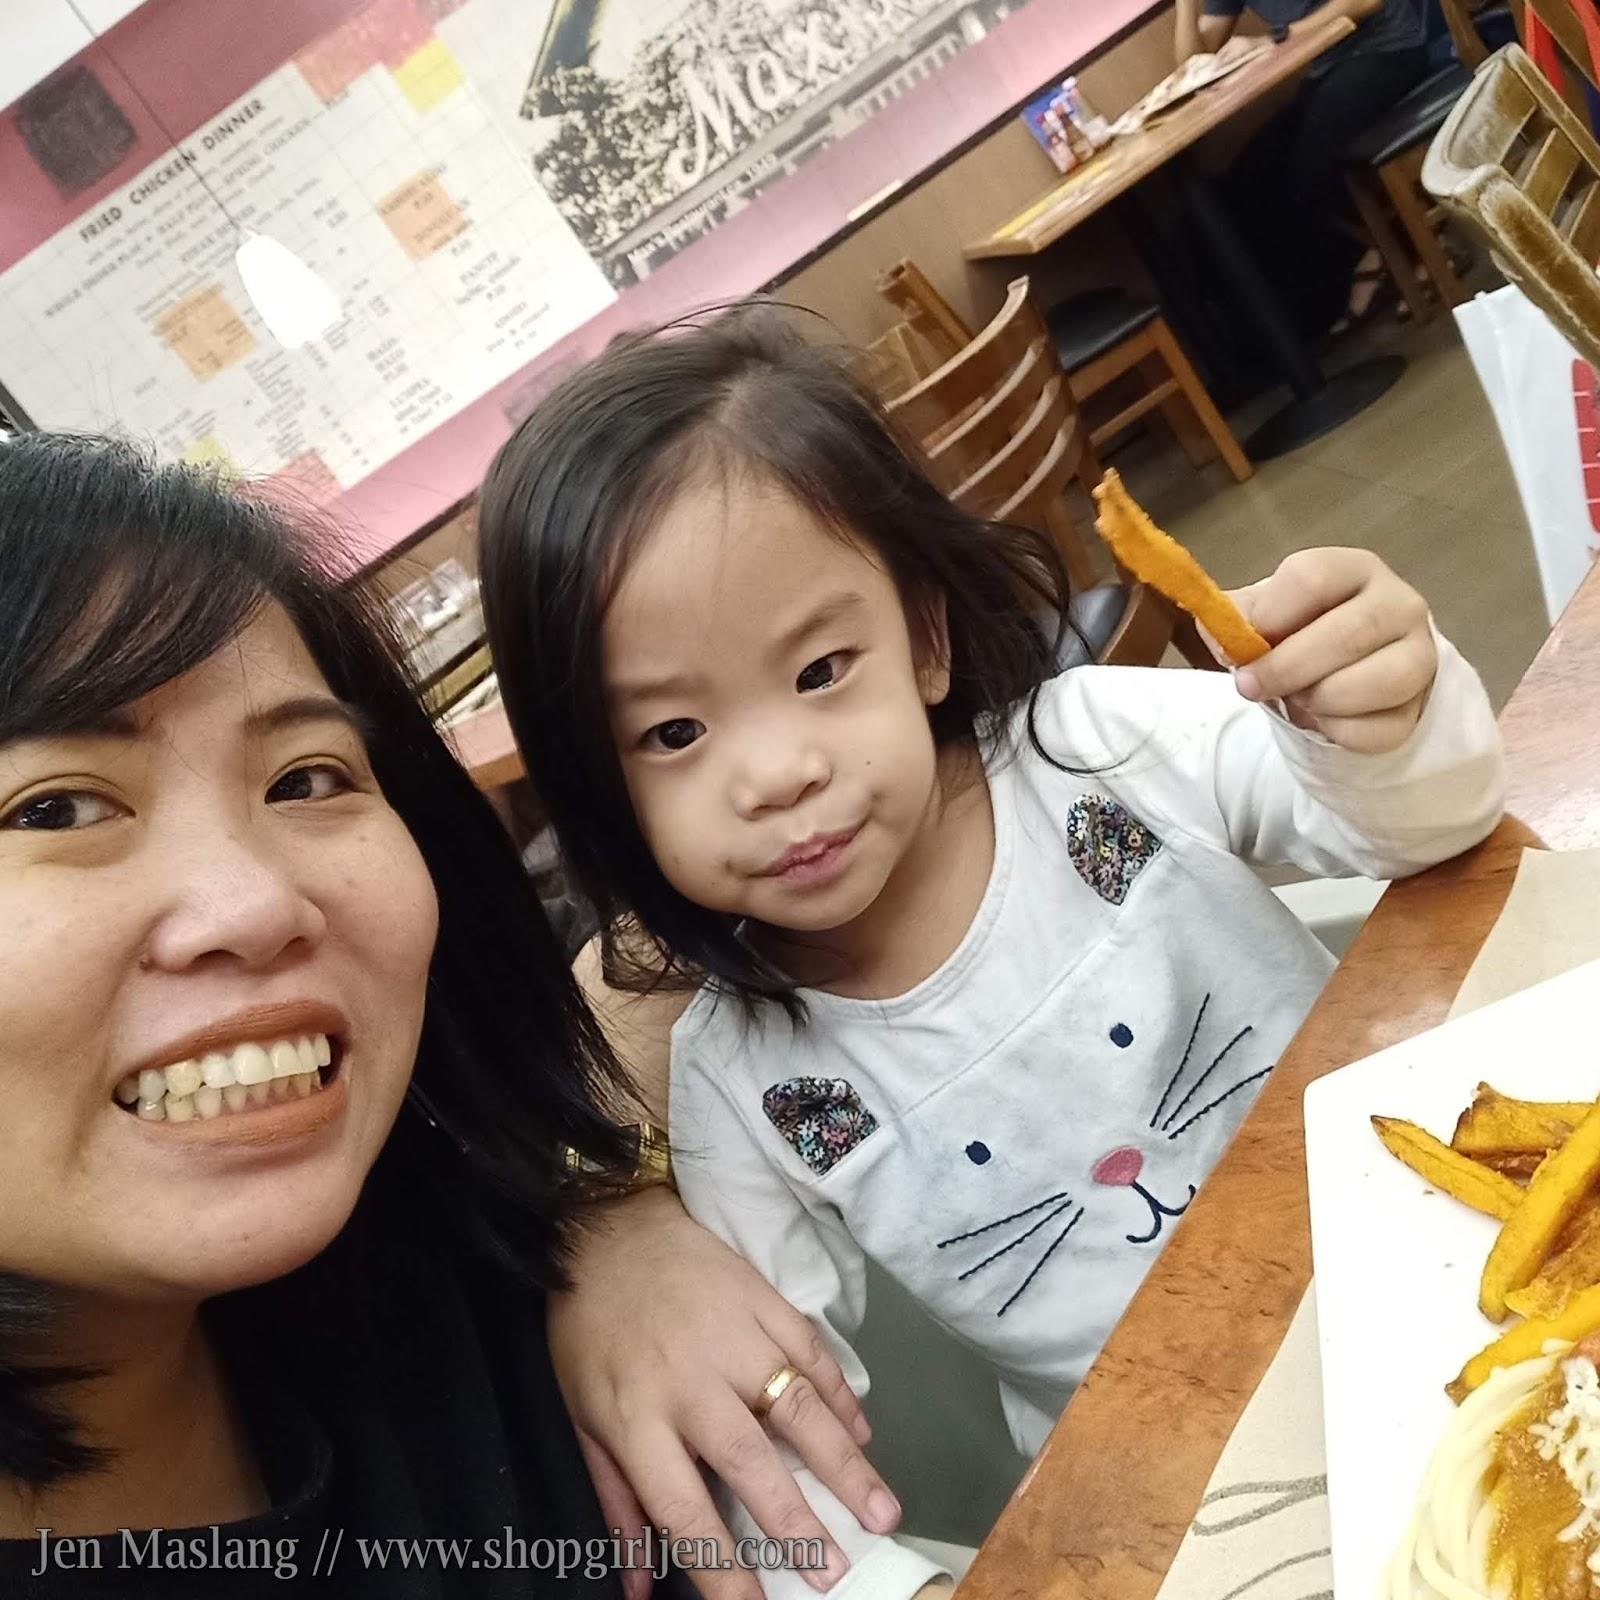 Shopgirl Jen: KIDS EAT FOR FREE AT MAX'S